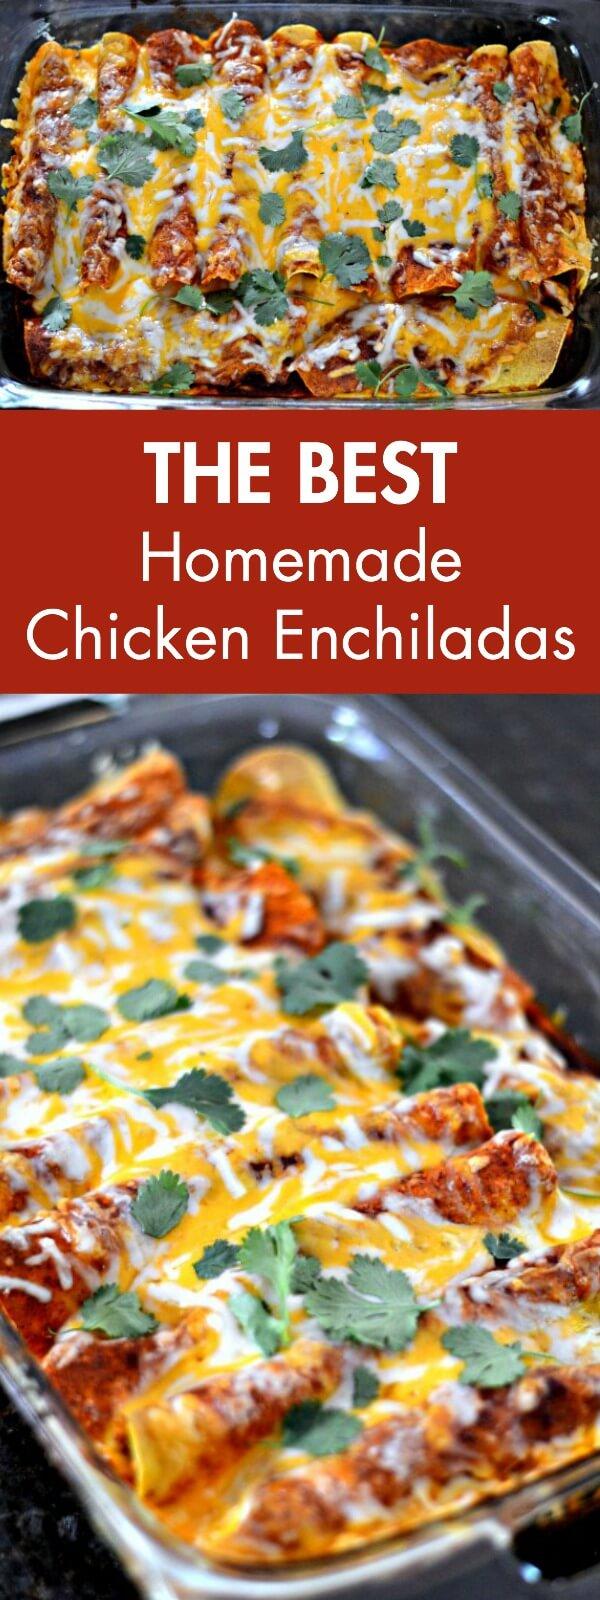 Homemade Chicken Enchiladas